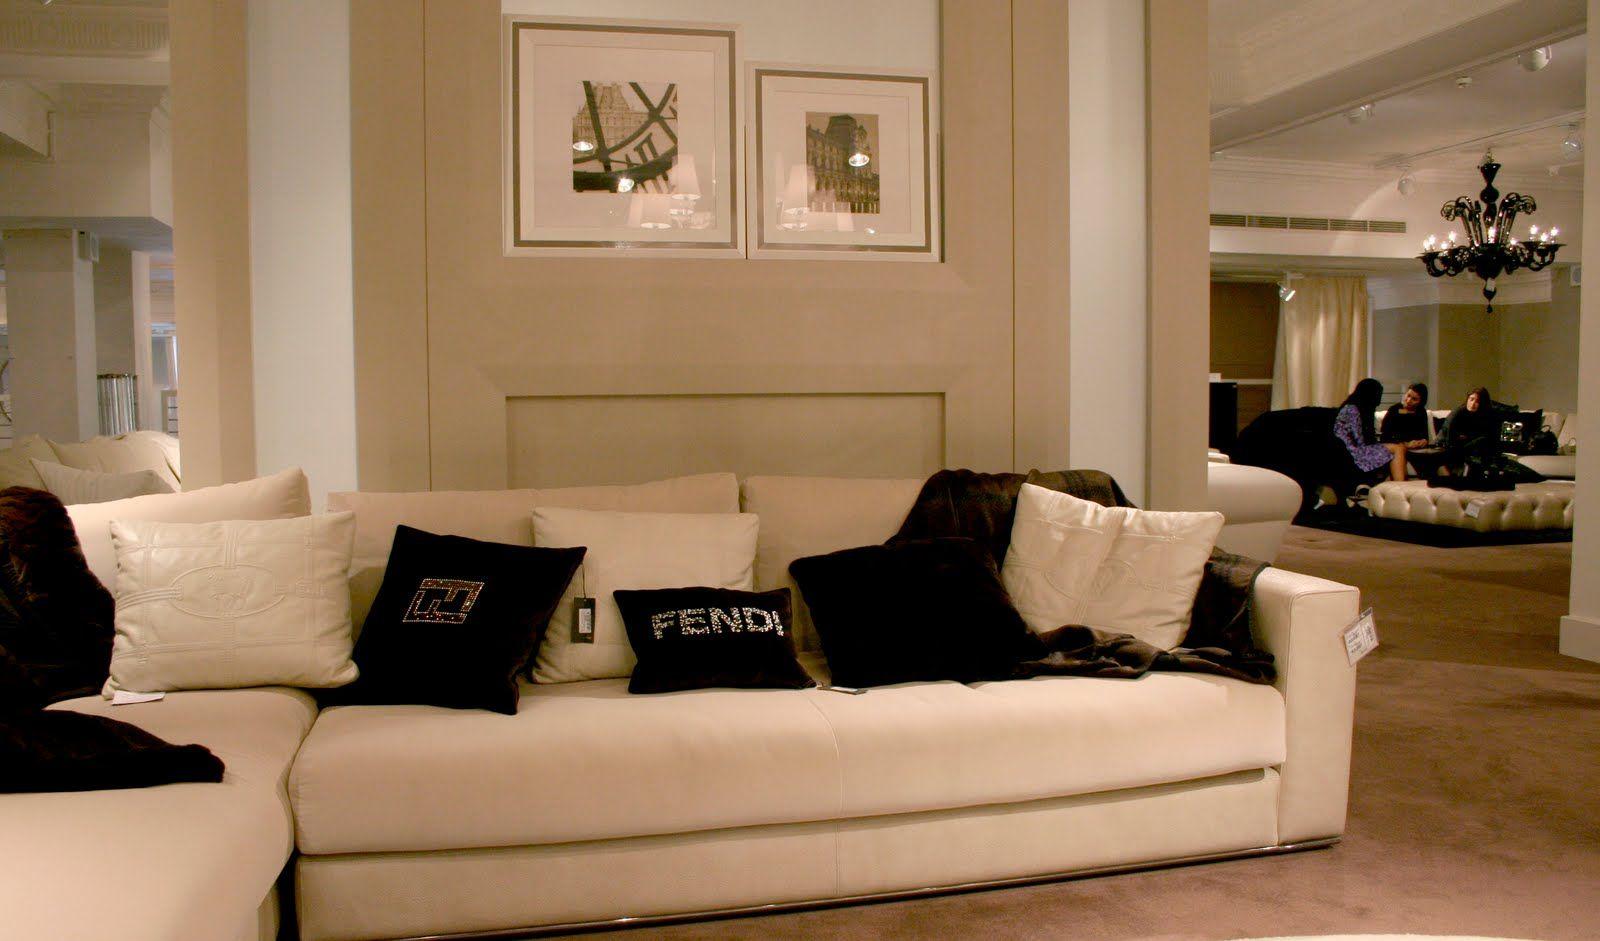 Superieur Fendi Furniture Catalogue | Top 10 Famous Furniture Brands   Fendi Casa